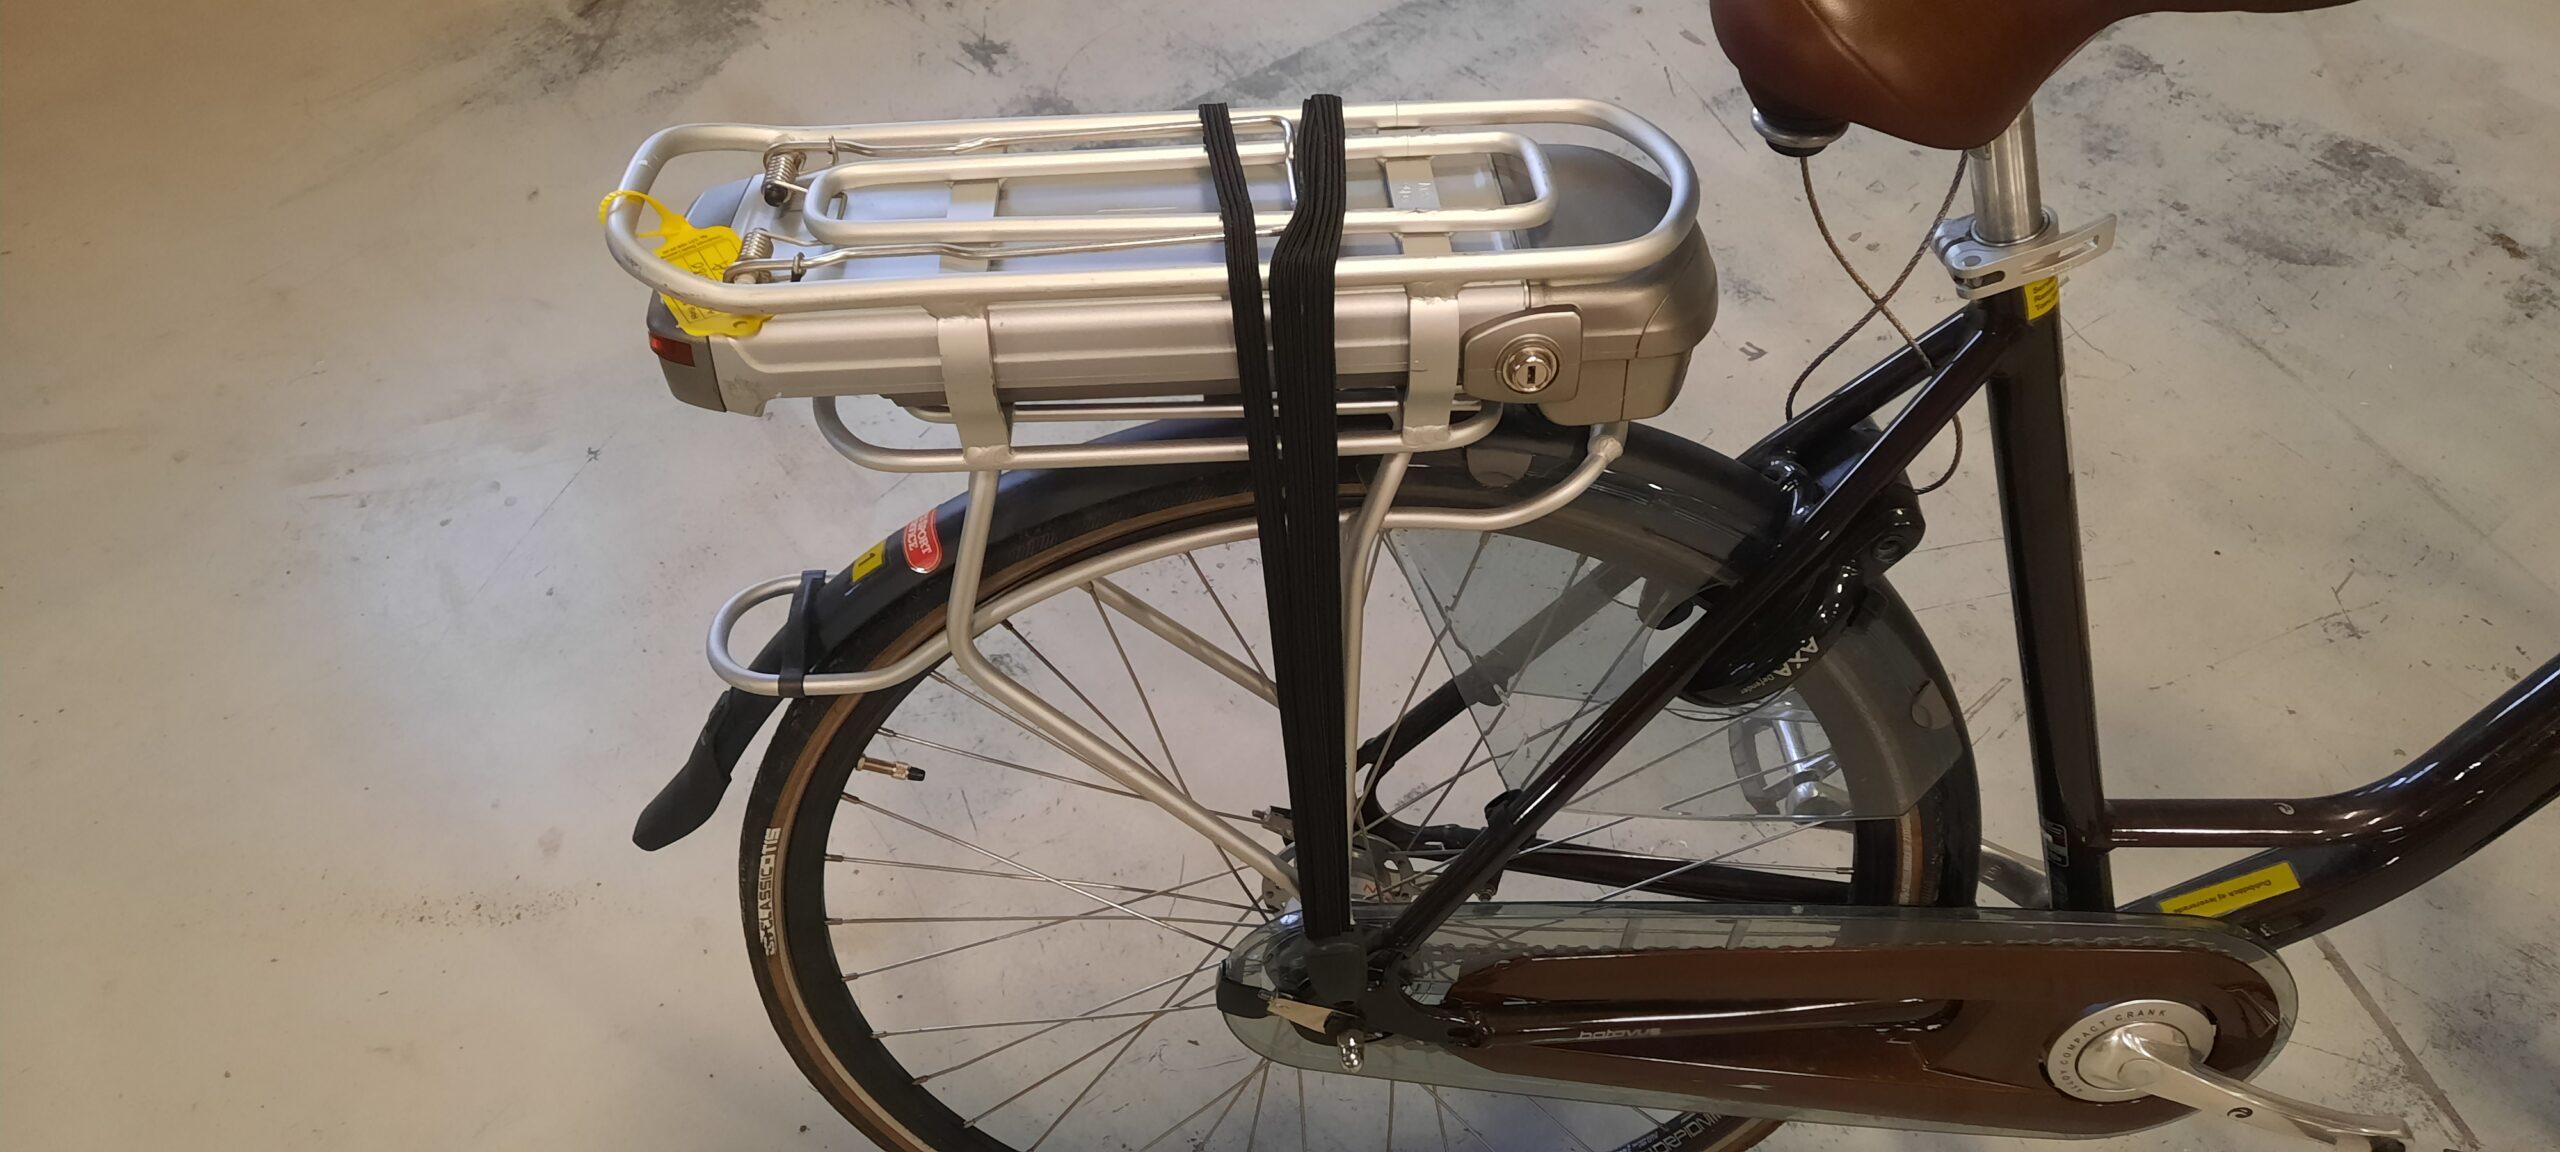 Batavus elcykel batteri